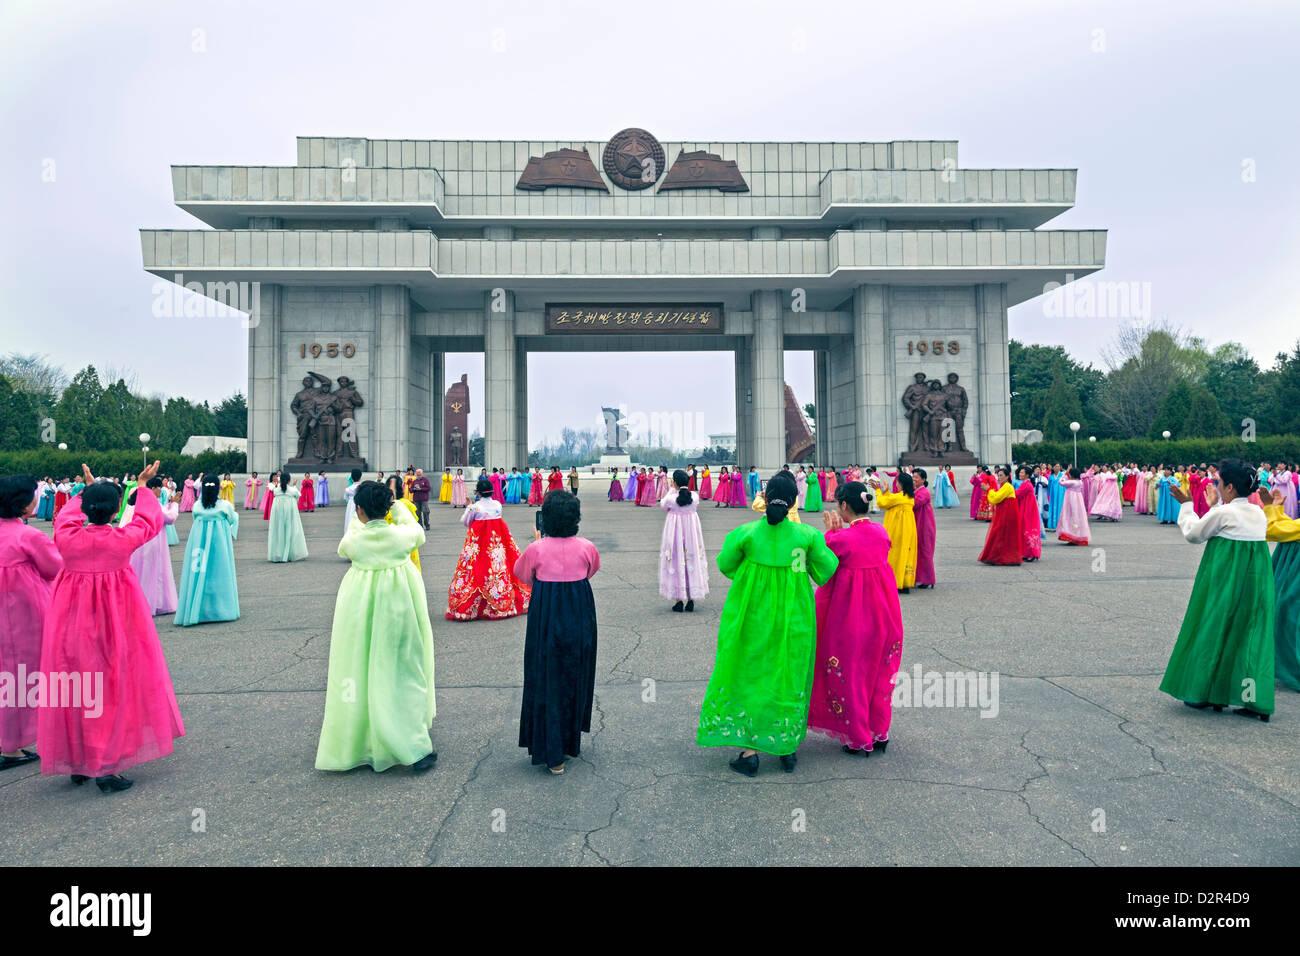 Frauen in bunten traditionellen Kleidern an Masse tanzen, Pyongyang, Nordkorea Stockbild